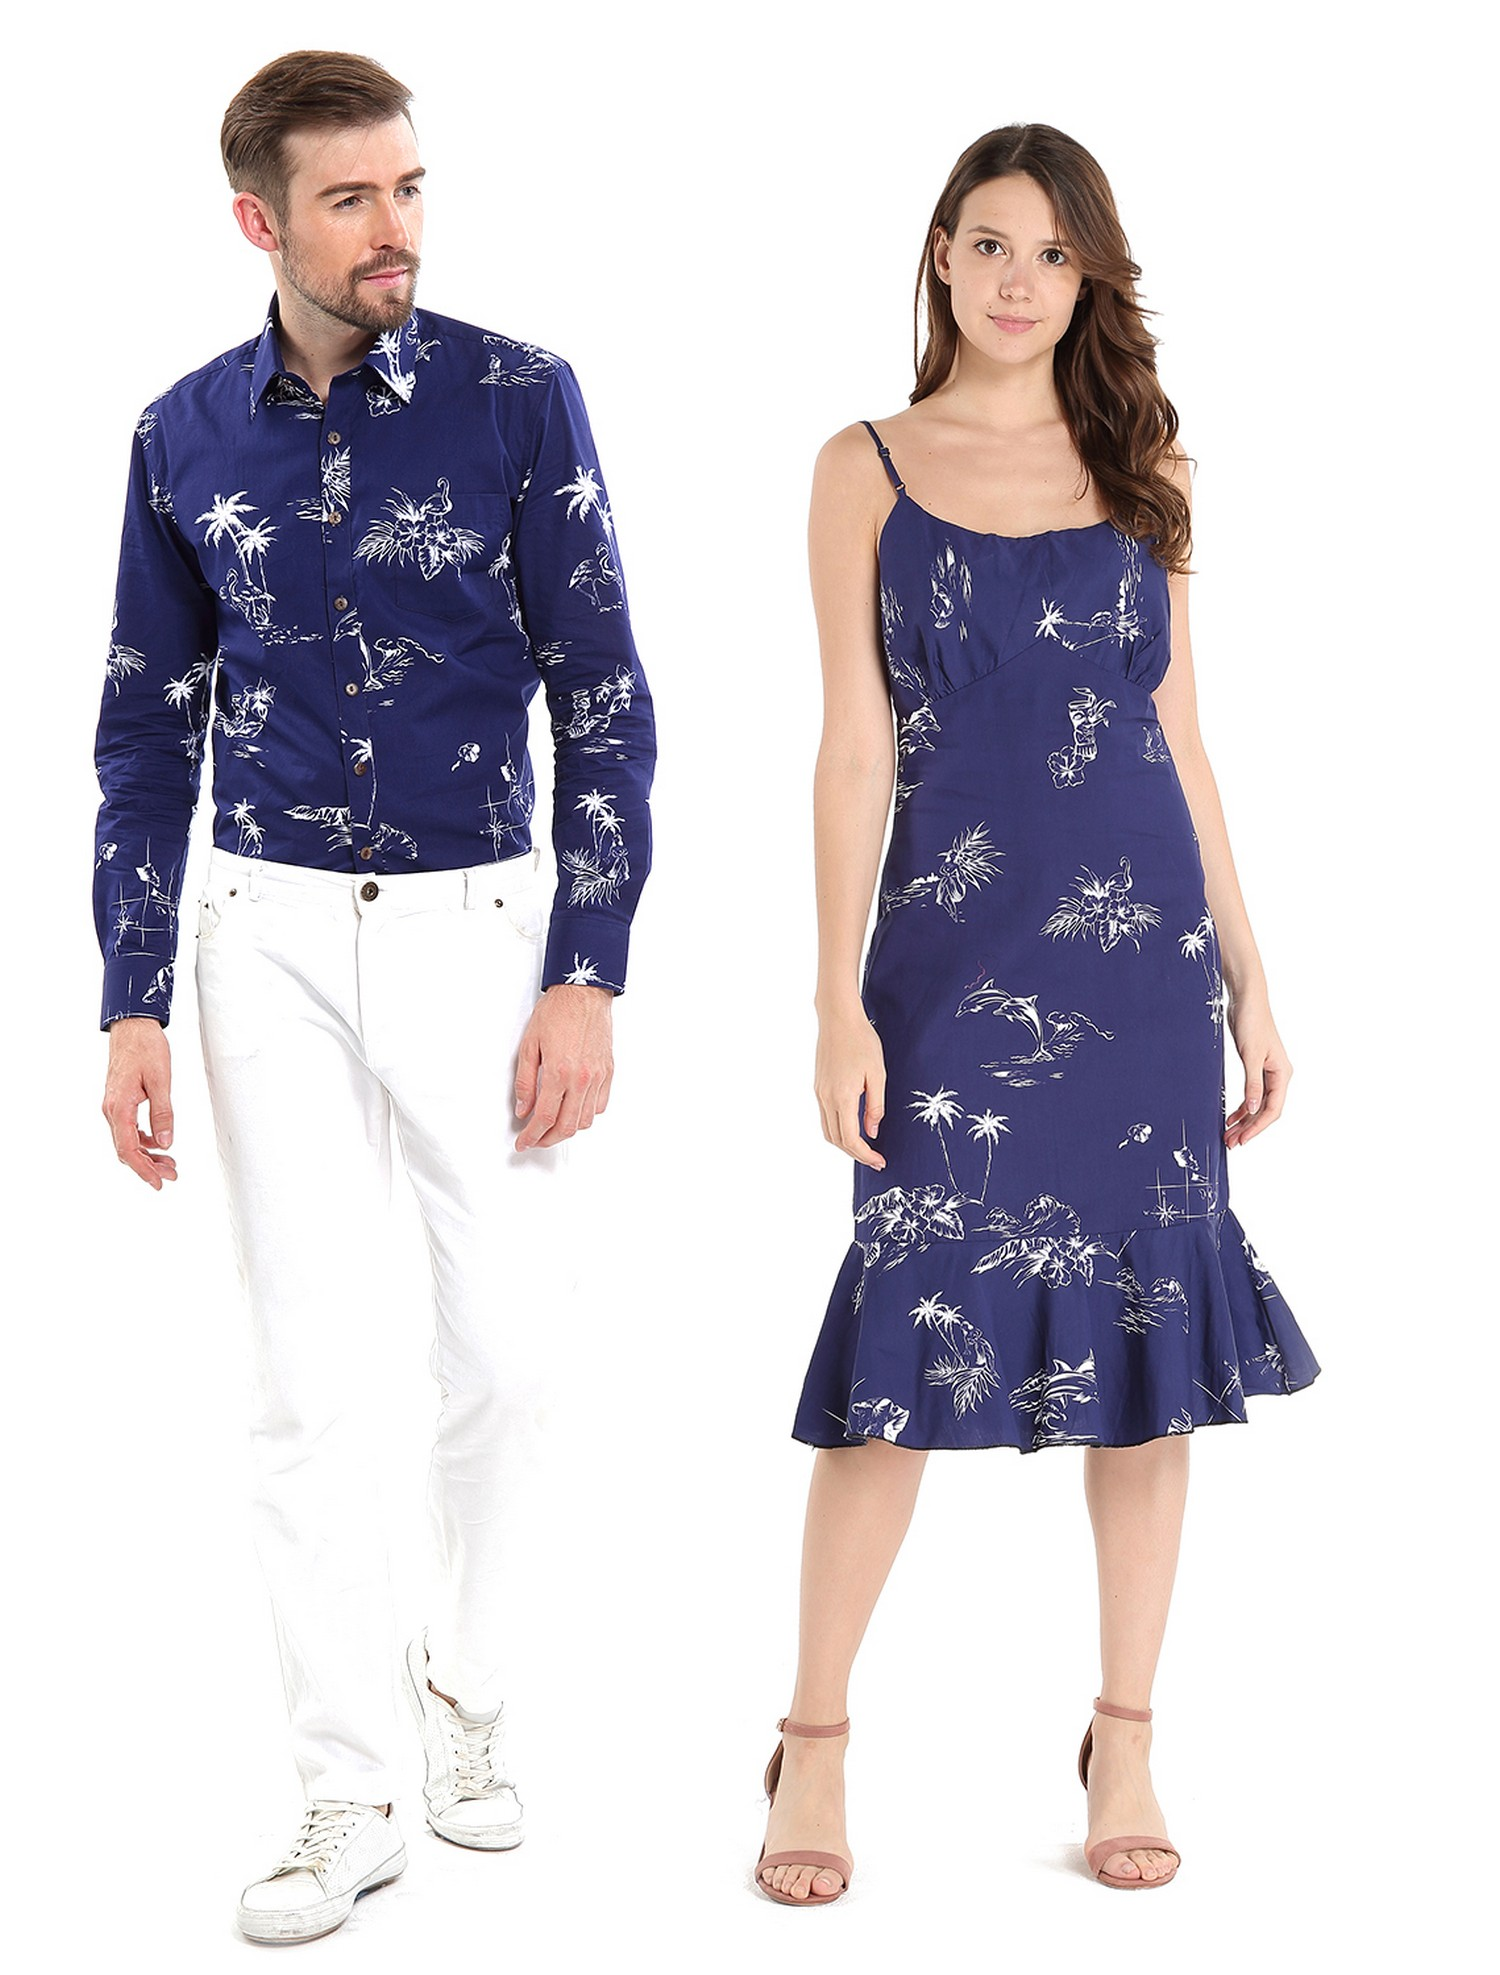 f6f0658a Hawaii Hangover - Couple Matching Hawaiian Luau Cruise Outfit Shirt ...